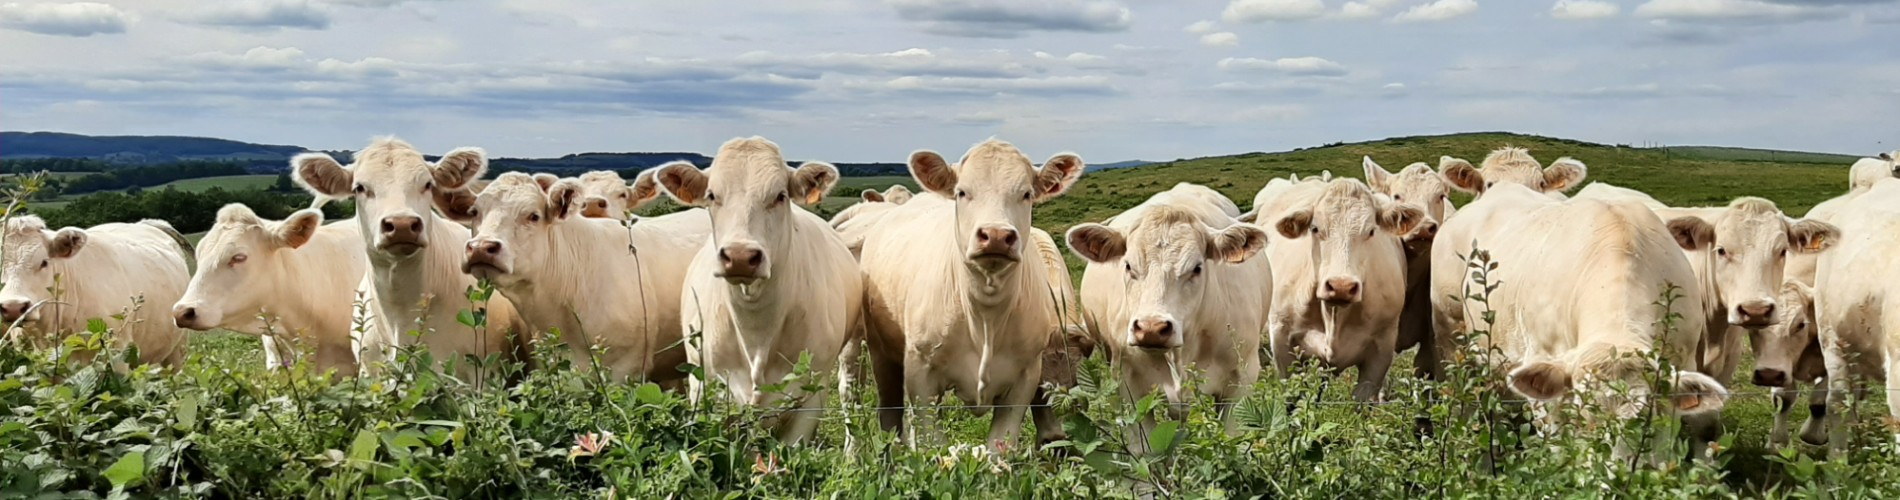 Koeien 2 1900x500